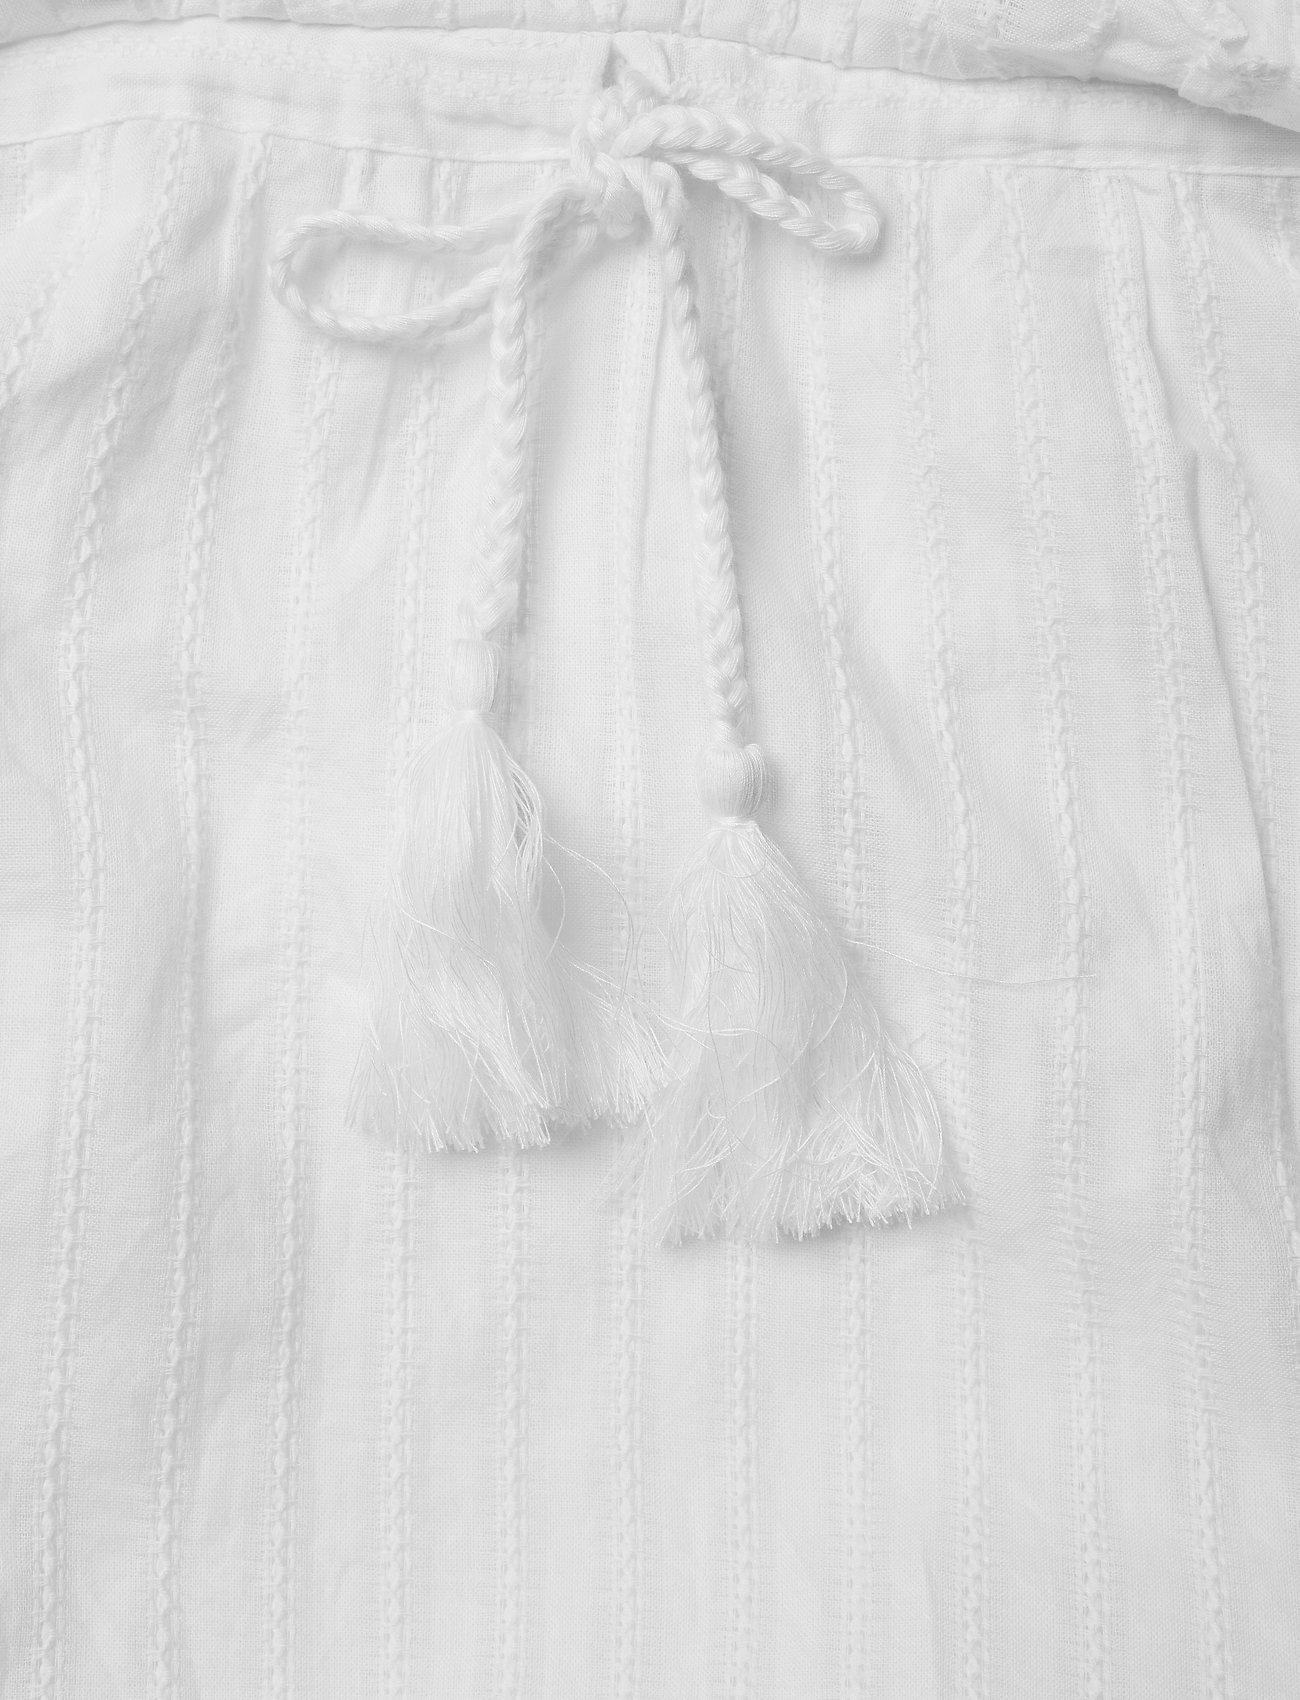 Dresssummer Broidery WhiteFrench Cotton Cotton Dresssummer Broidery Connection 5Lq3Rj4A